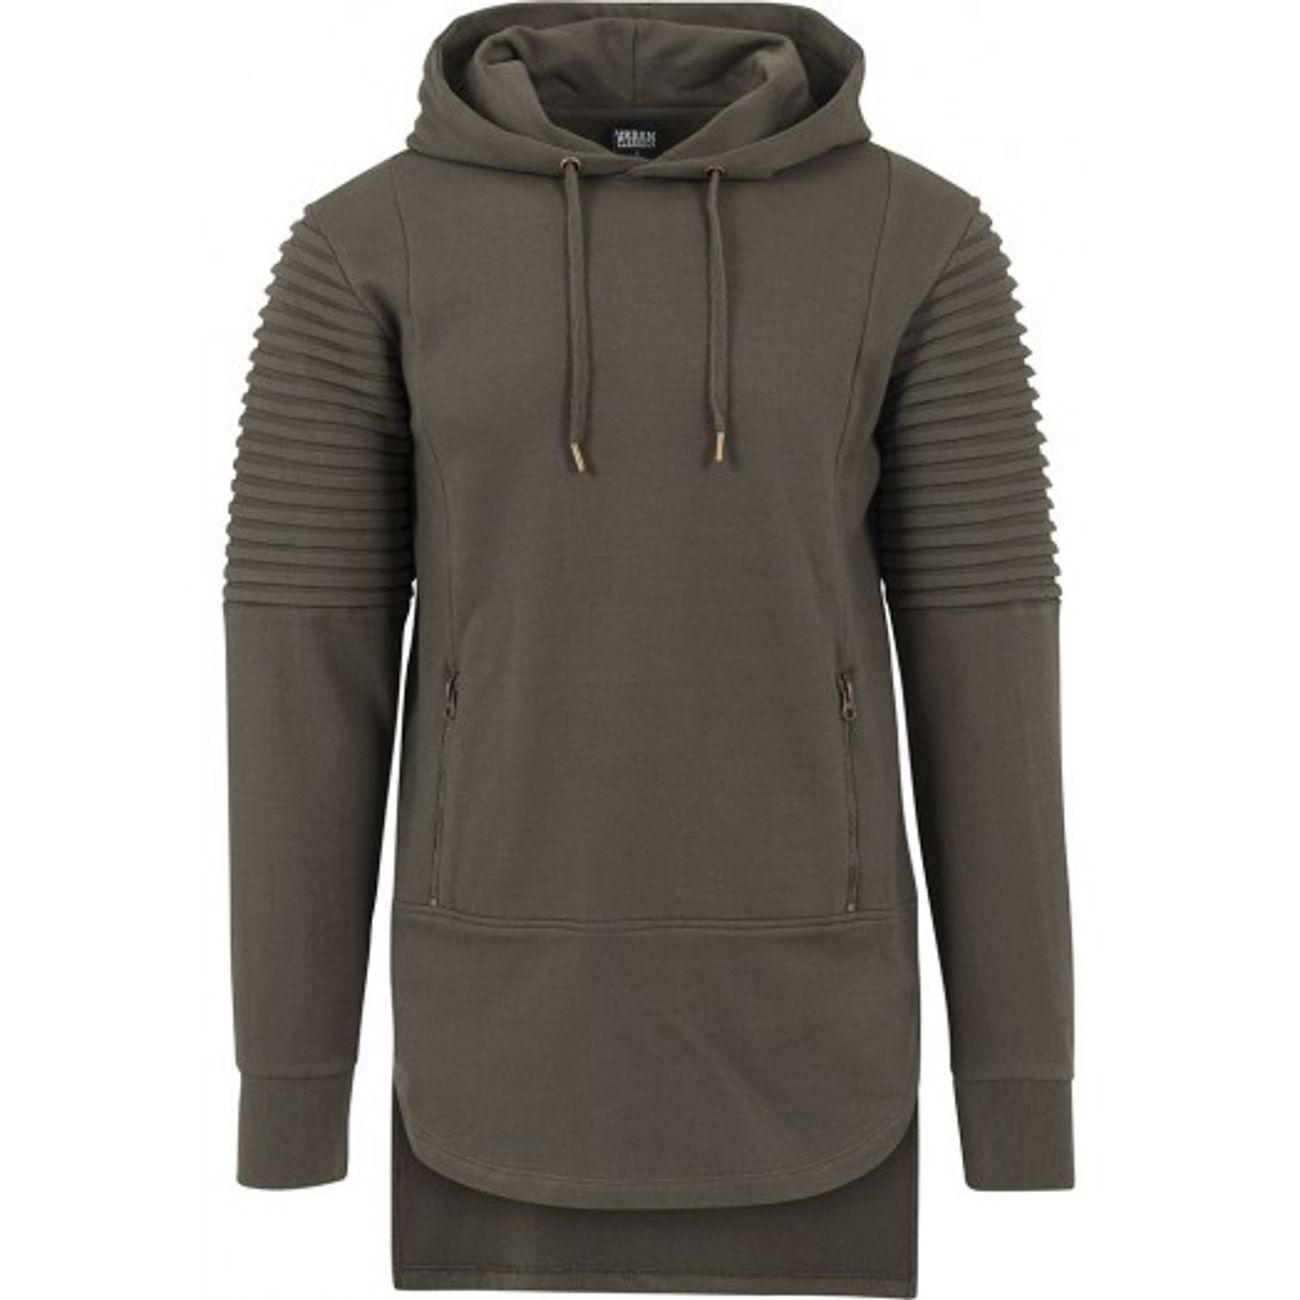 Mode- Lifestyle adulte URBAN CLASSICS Sweat Capuche Oversize Urban Classics  Pleat Olive c382a2784eb0